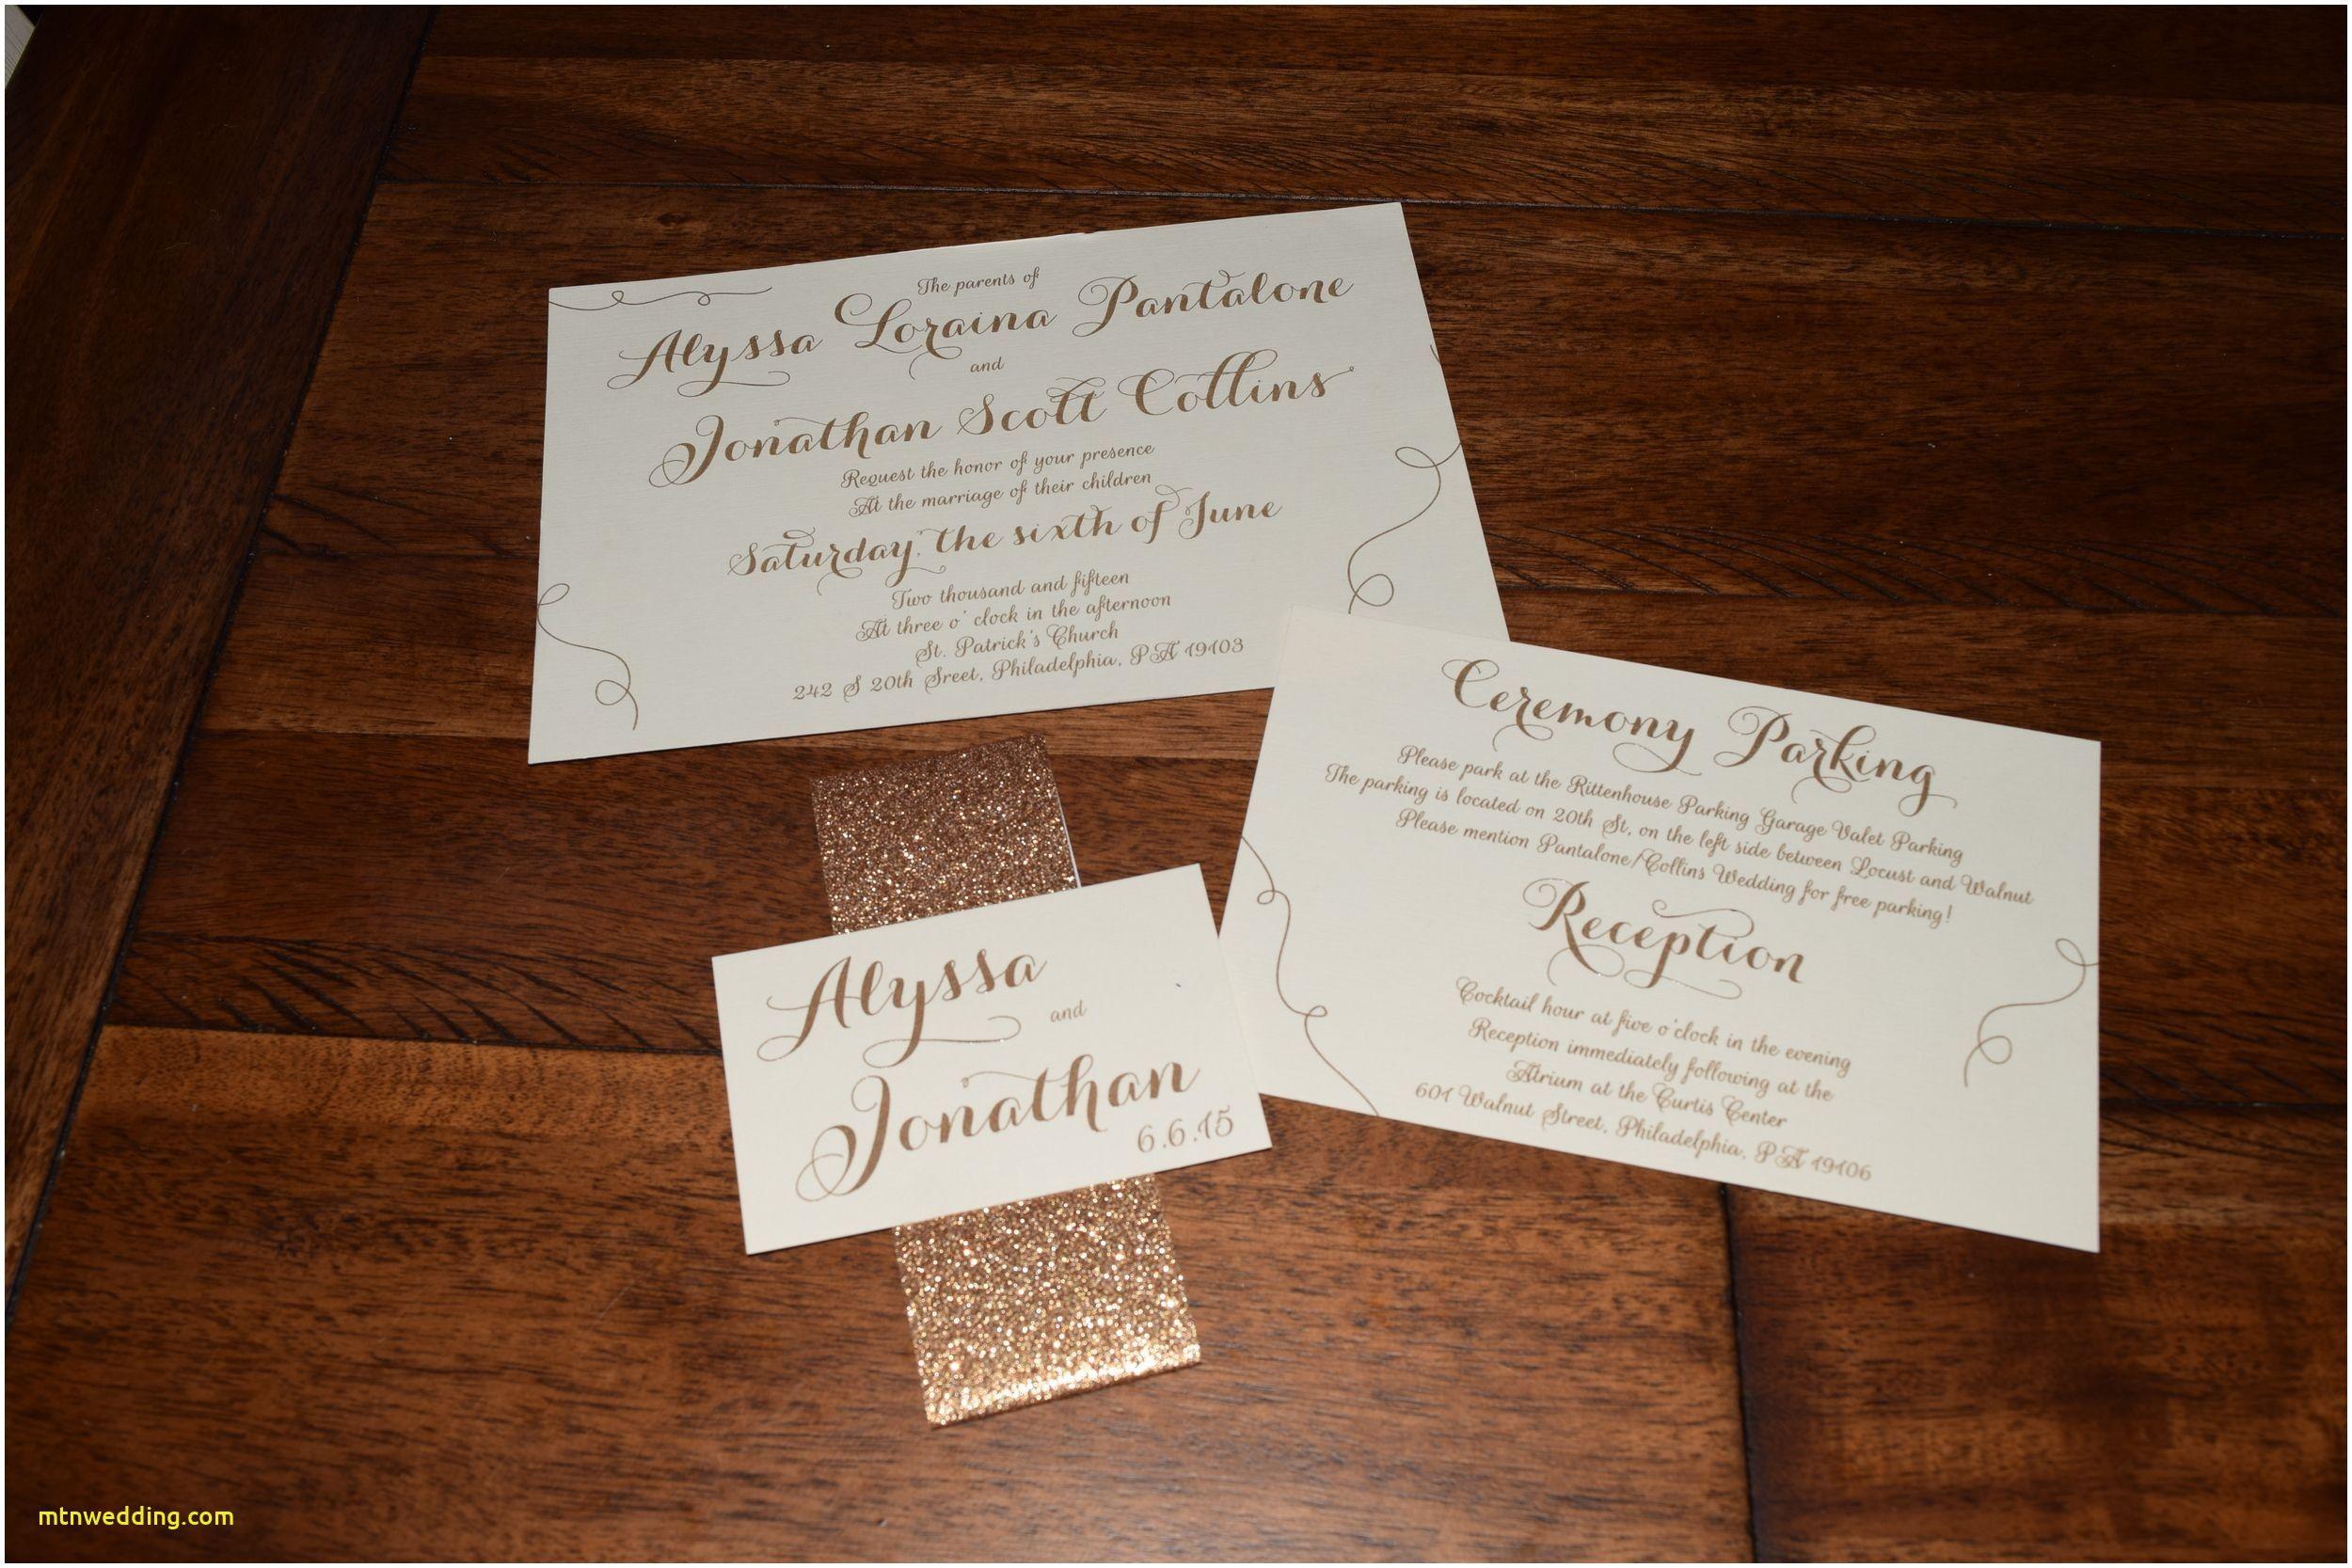 Awesome Bling Wedding Invitations Uk Check More At Https Mtnwedding Com Wedding Invitation Bling Wedding Invitations Uk